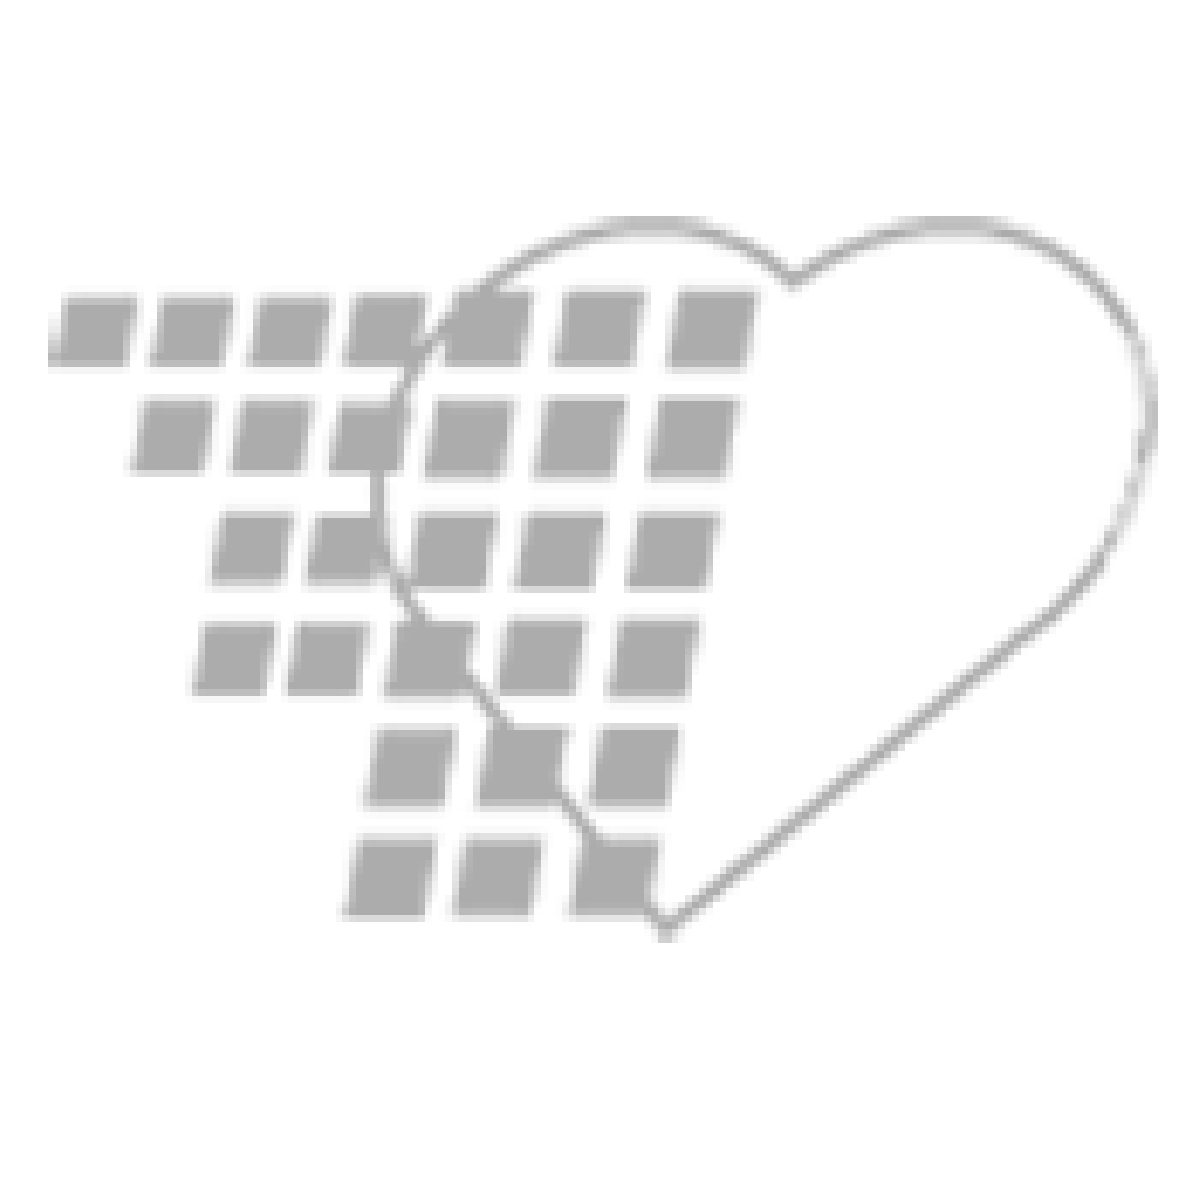 06-82-9628 BD™ Luer-Lok™ Tip Syringe Only - 1 mL